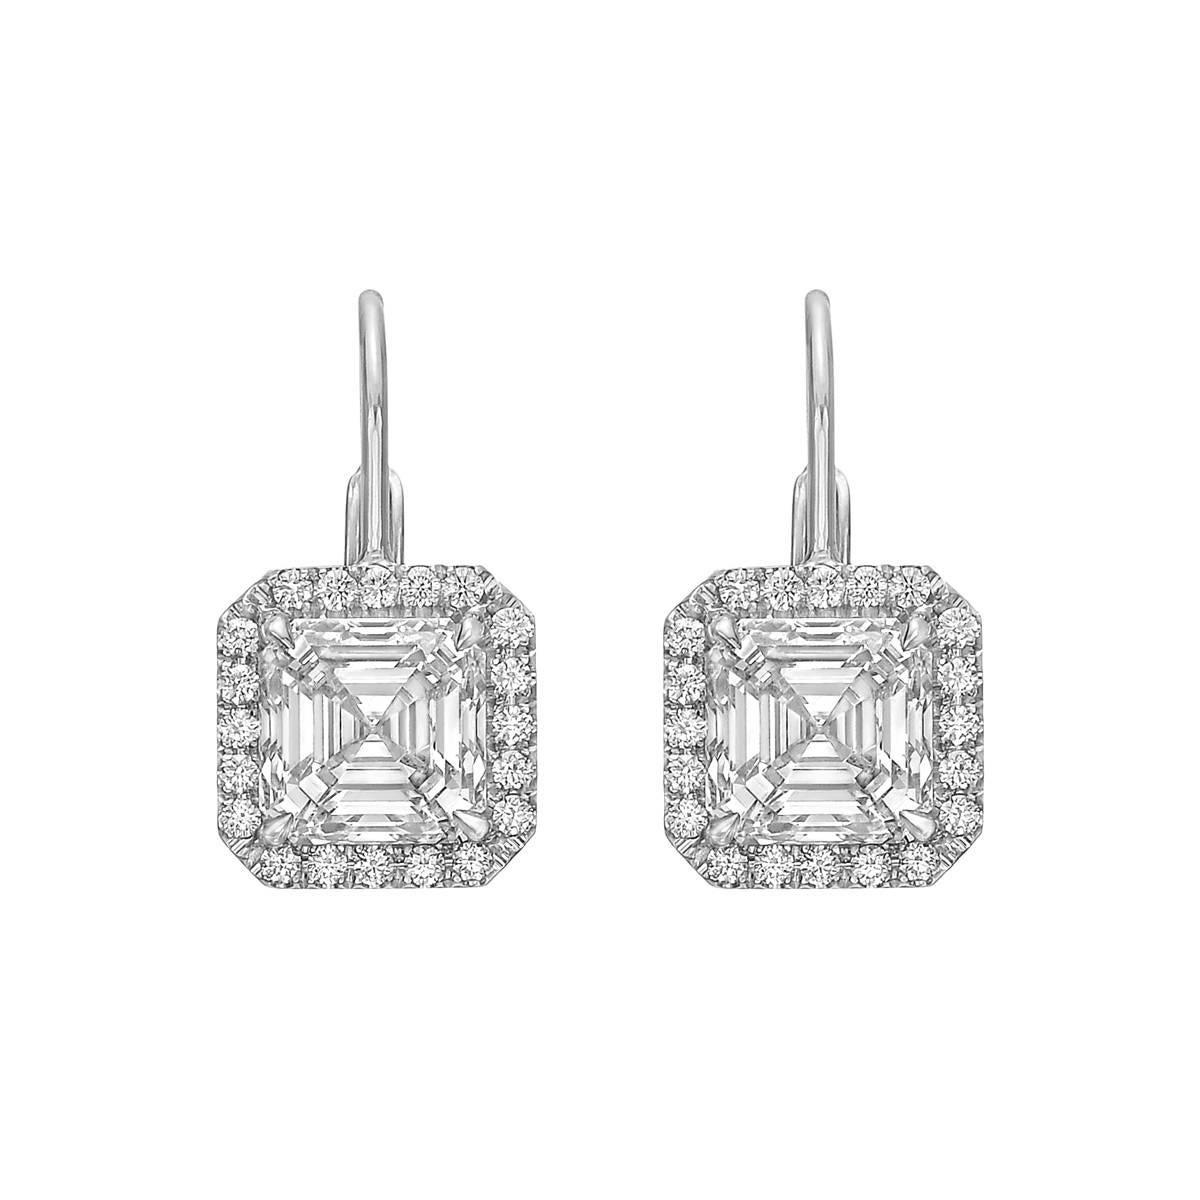 Betteridge Square Emerald Cut Diamond Halo Drop Earrings 4 35 Carat At 1stdibs